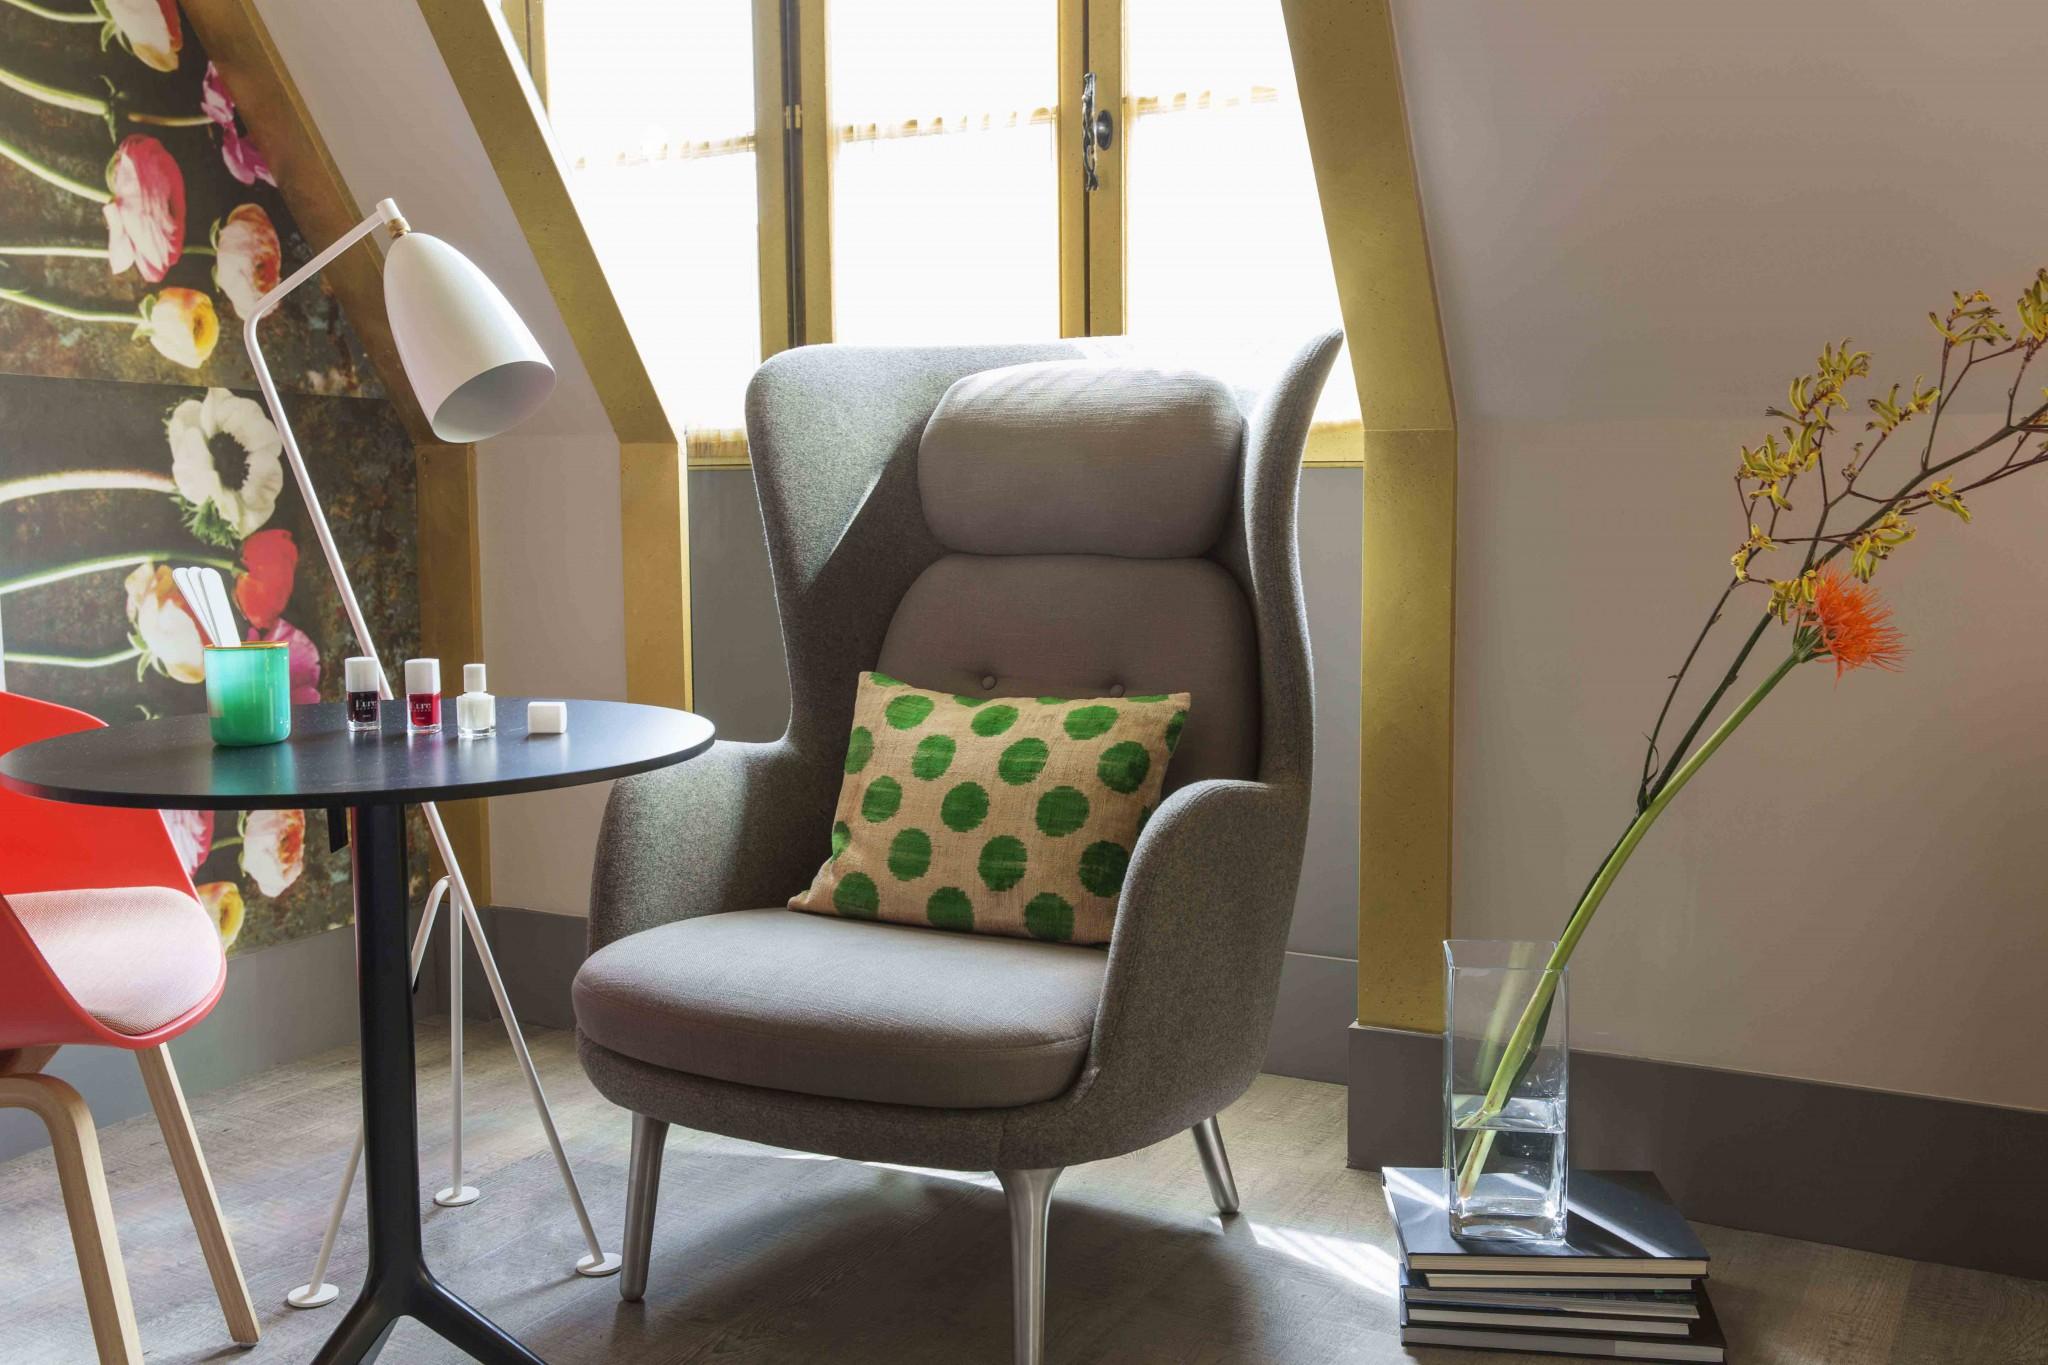 manucure kure bazaar soin et manucure bio kure bazaar. Black Bedroom Furniture Sets. Home Design Ideas